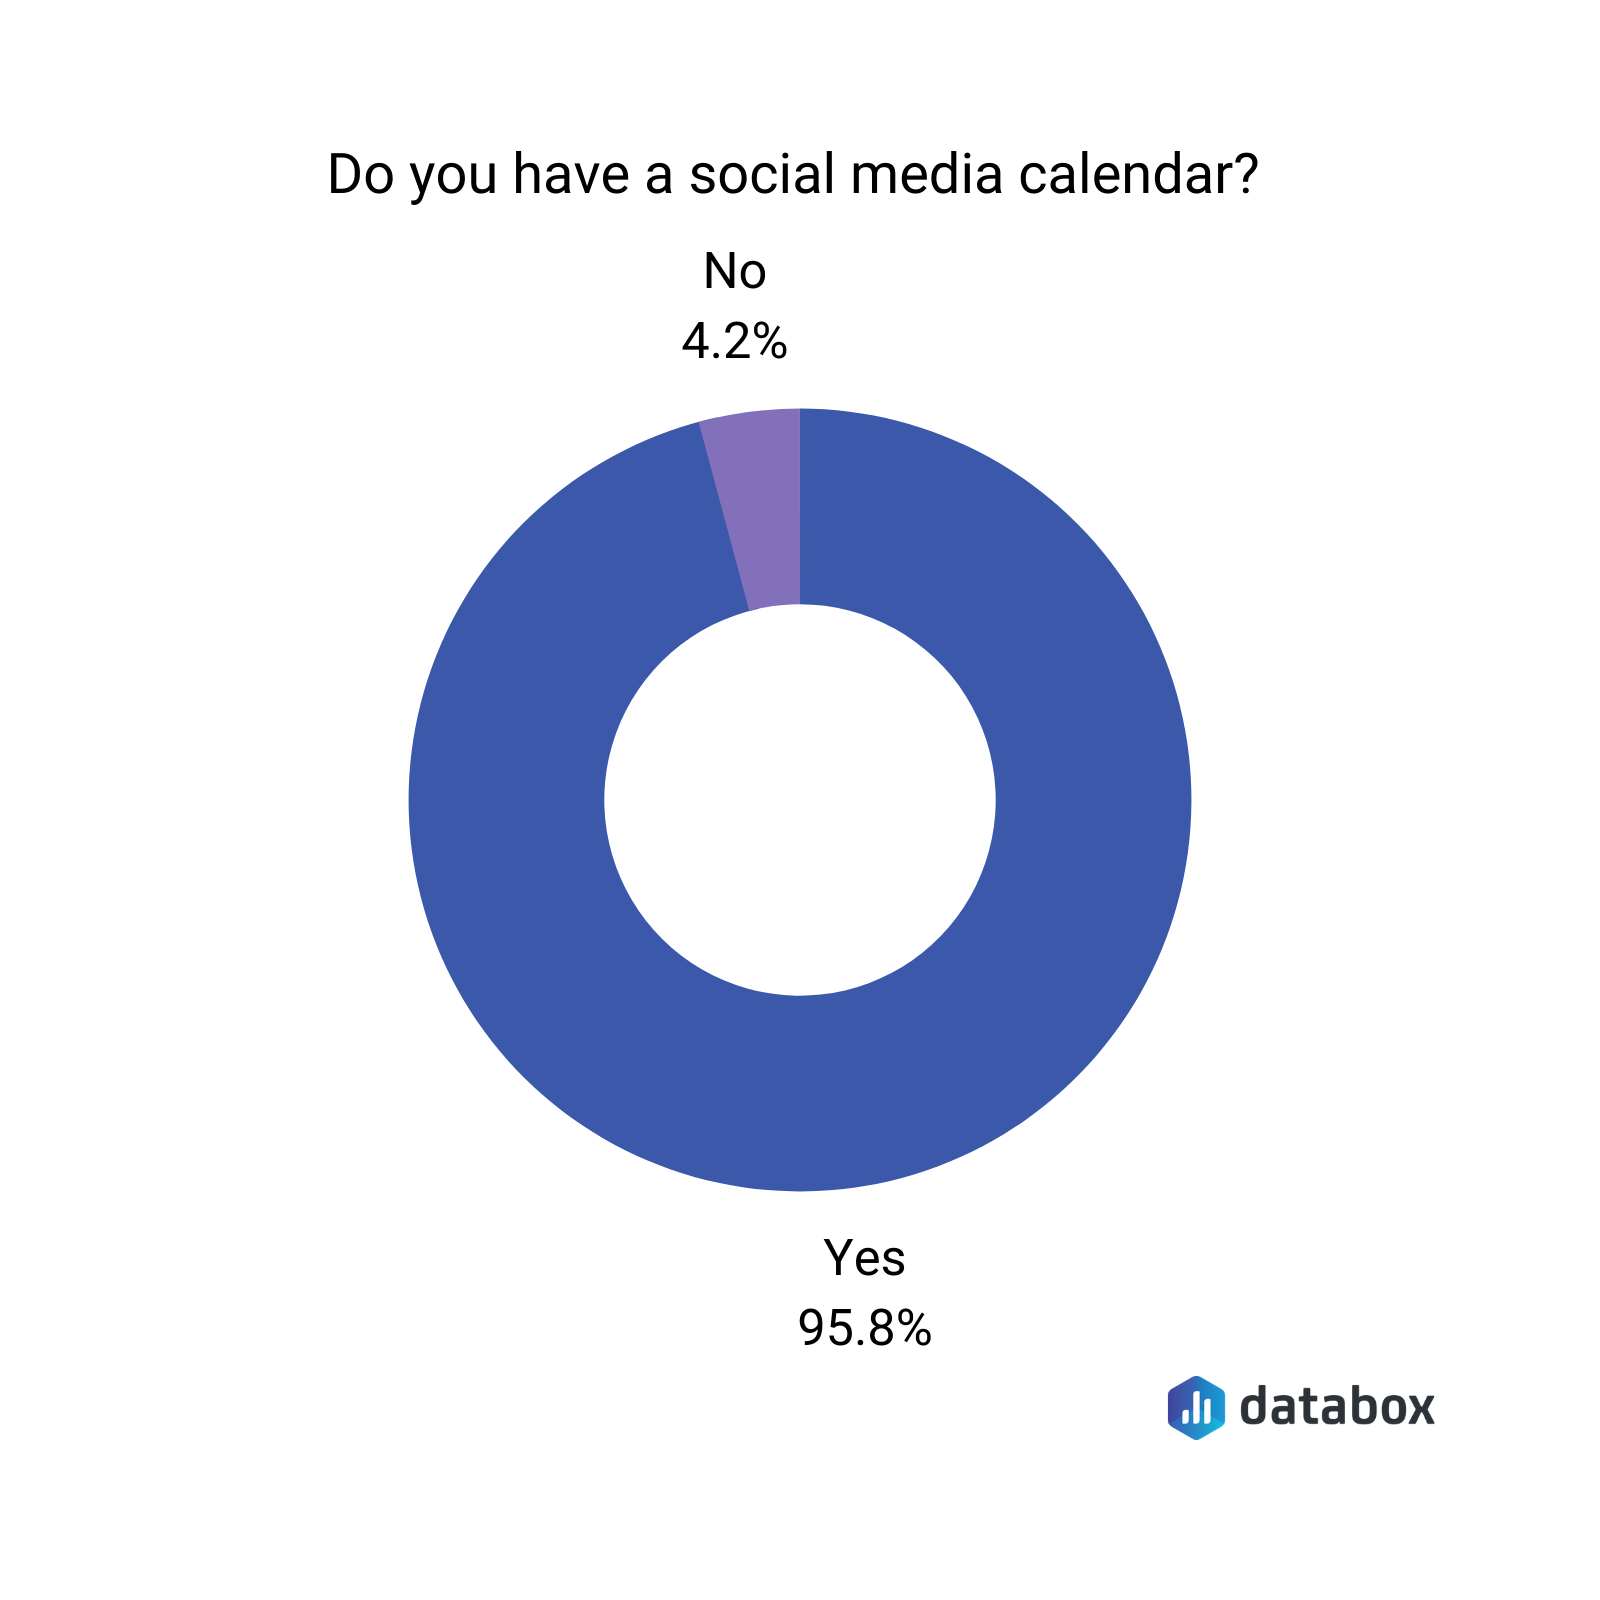 do you have a social media calendar